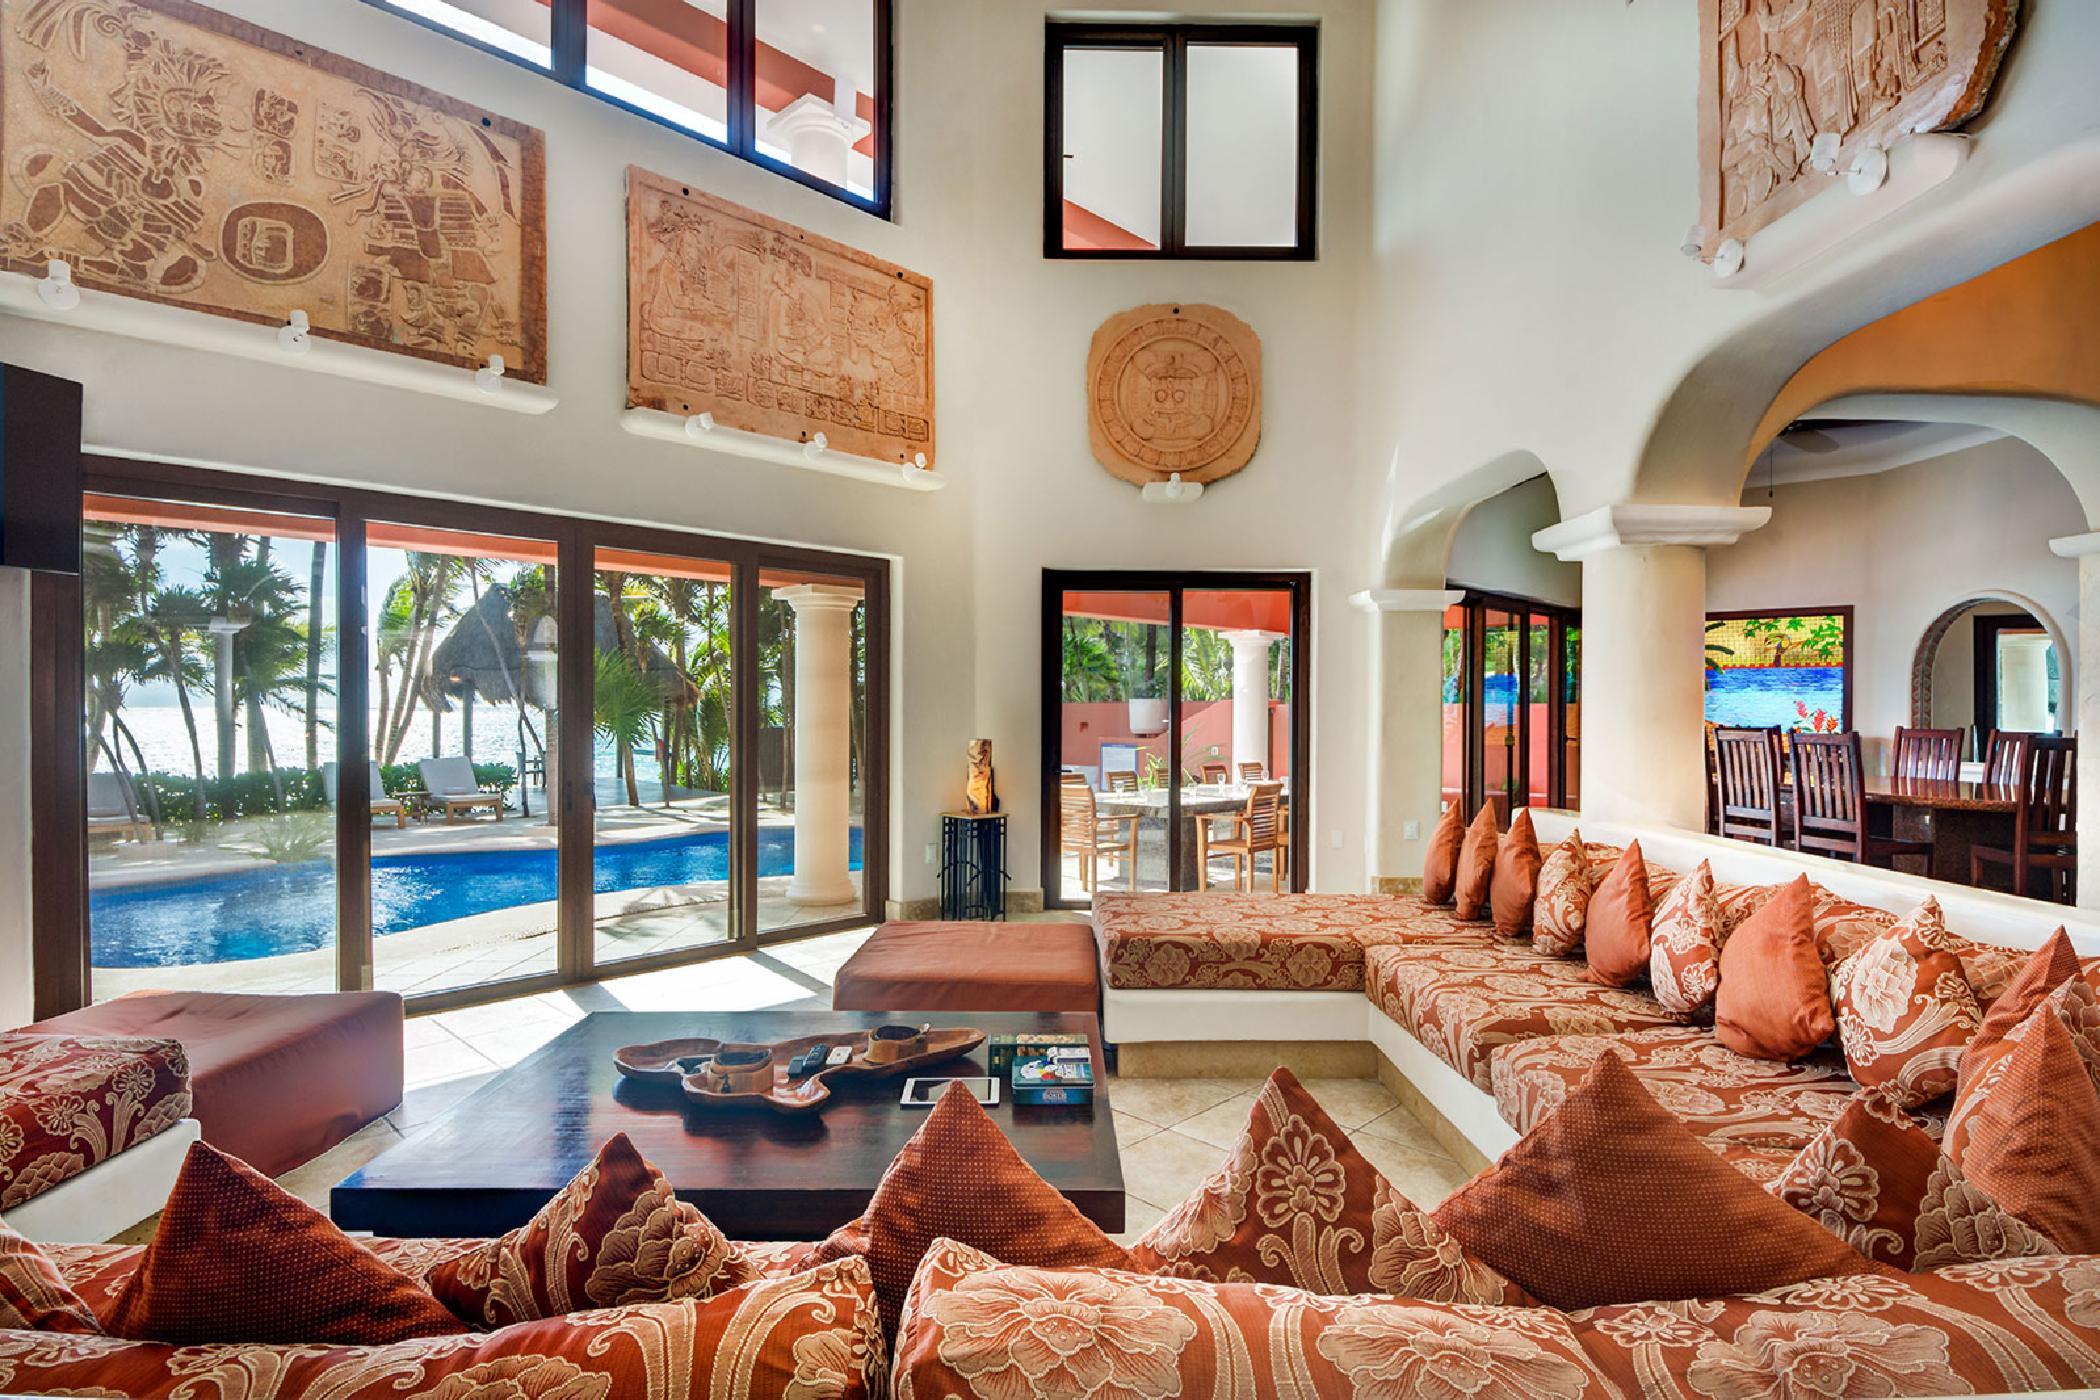 Agents_Maya_Luxe_Riviera_Maya_Luxury_Villas_Casa_Yardena12.jpg